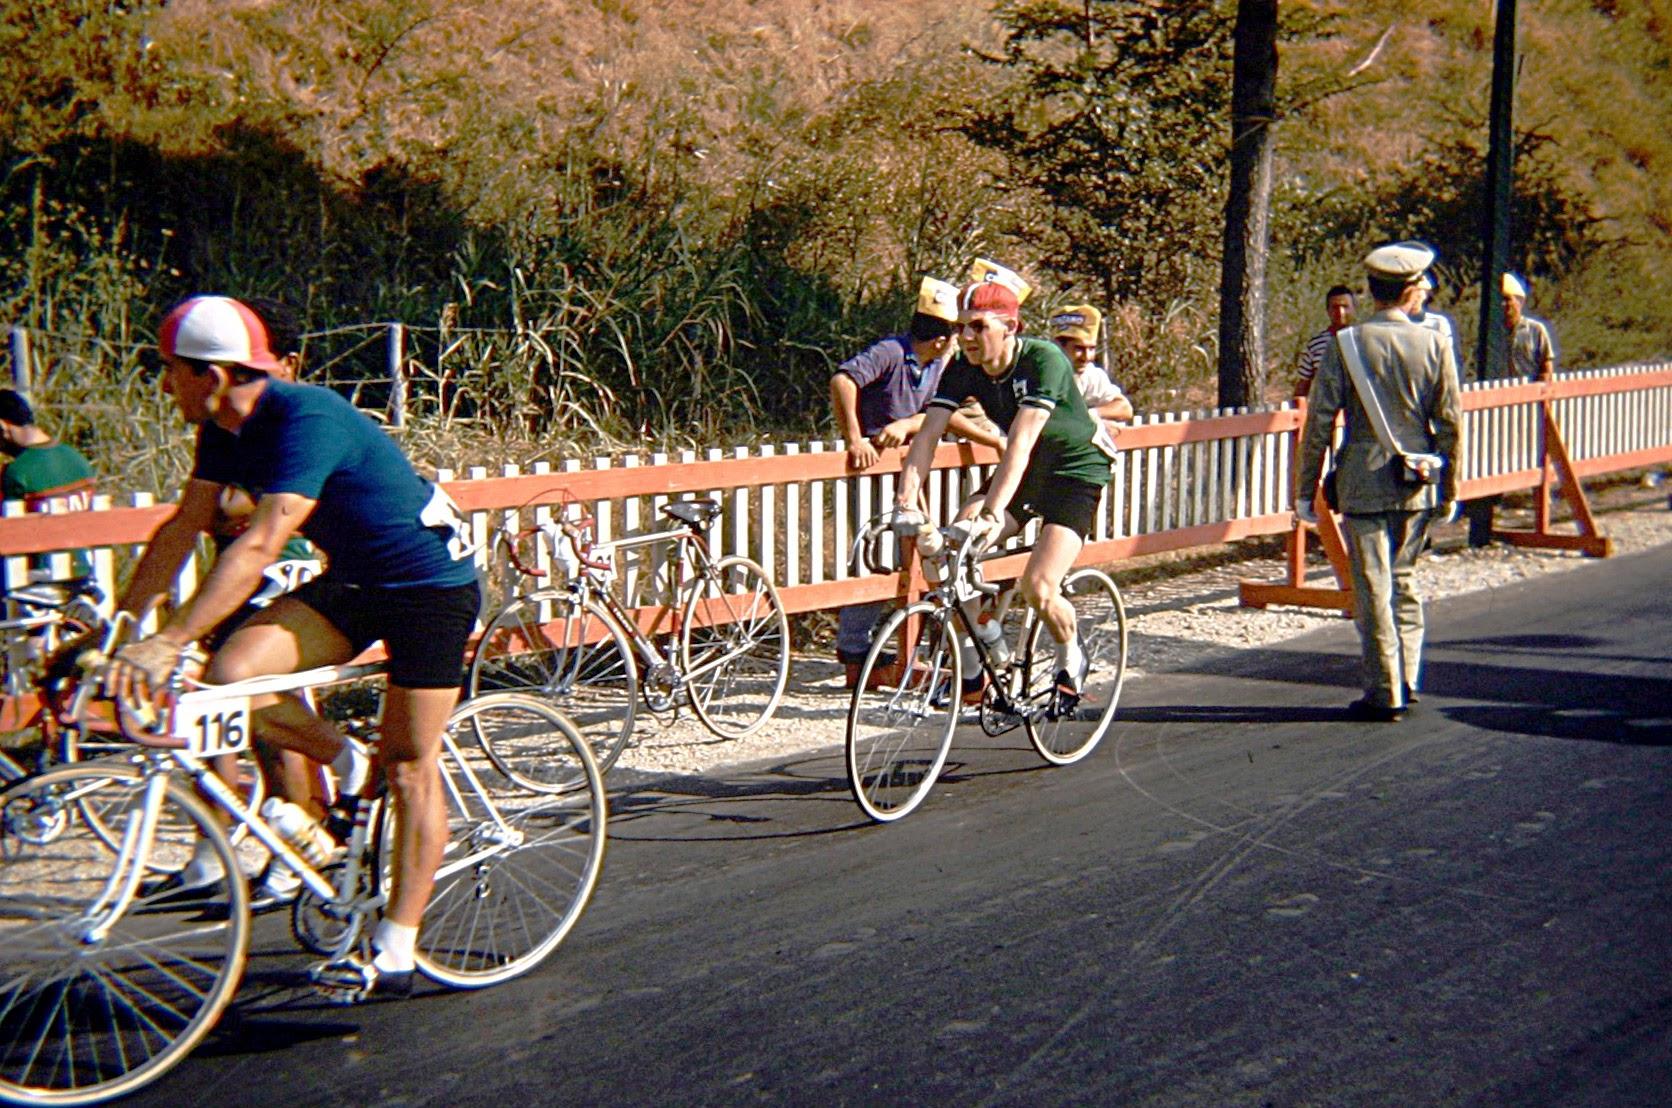 Seamus Herron follows an Italian rider to the start line of the road race. (Photo: © Sean B. Fox)